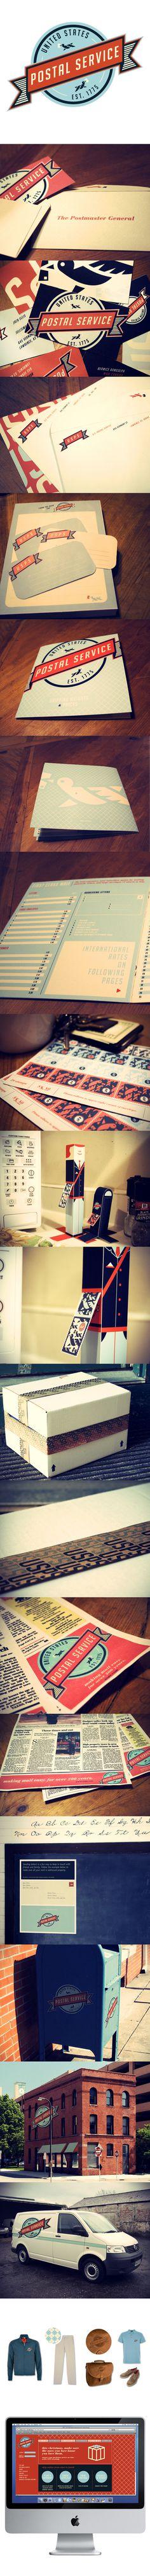 United States Postal Service Re-Branding #creative #usps #design #rebranding #brand